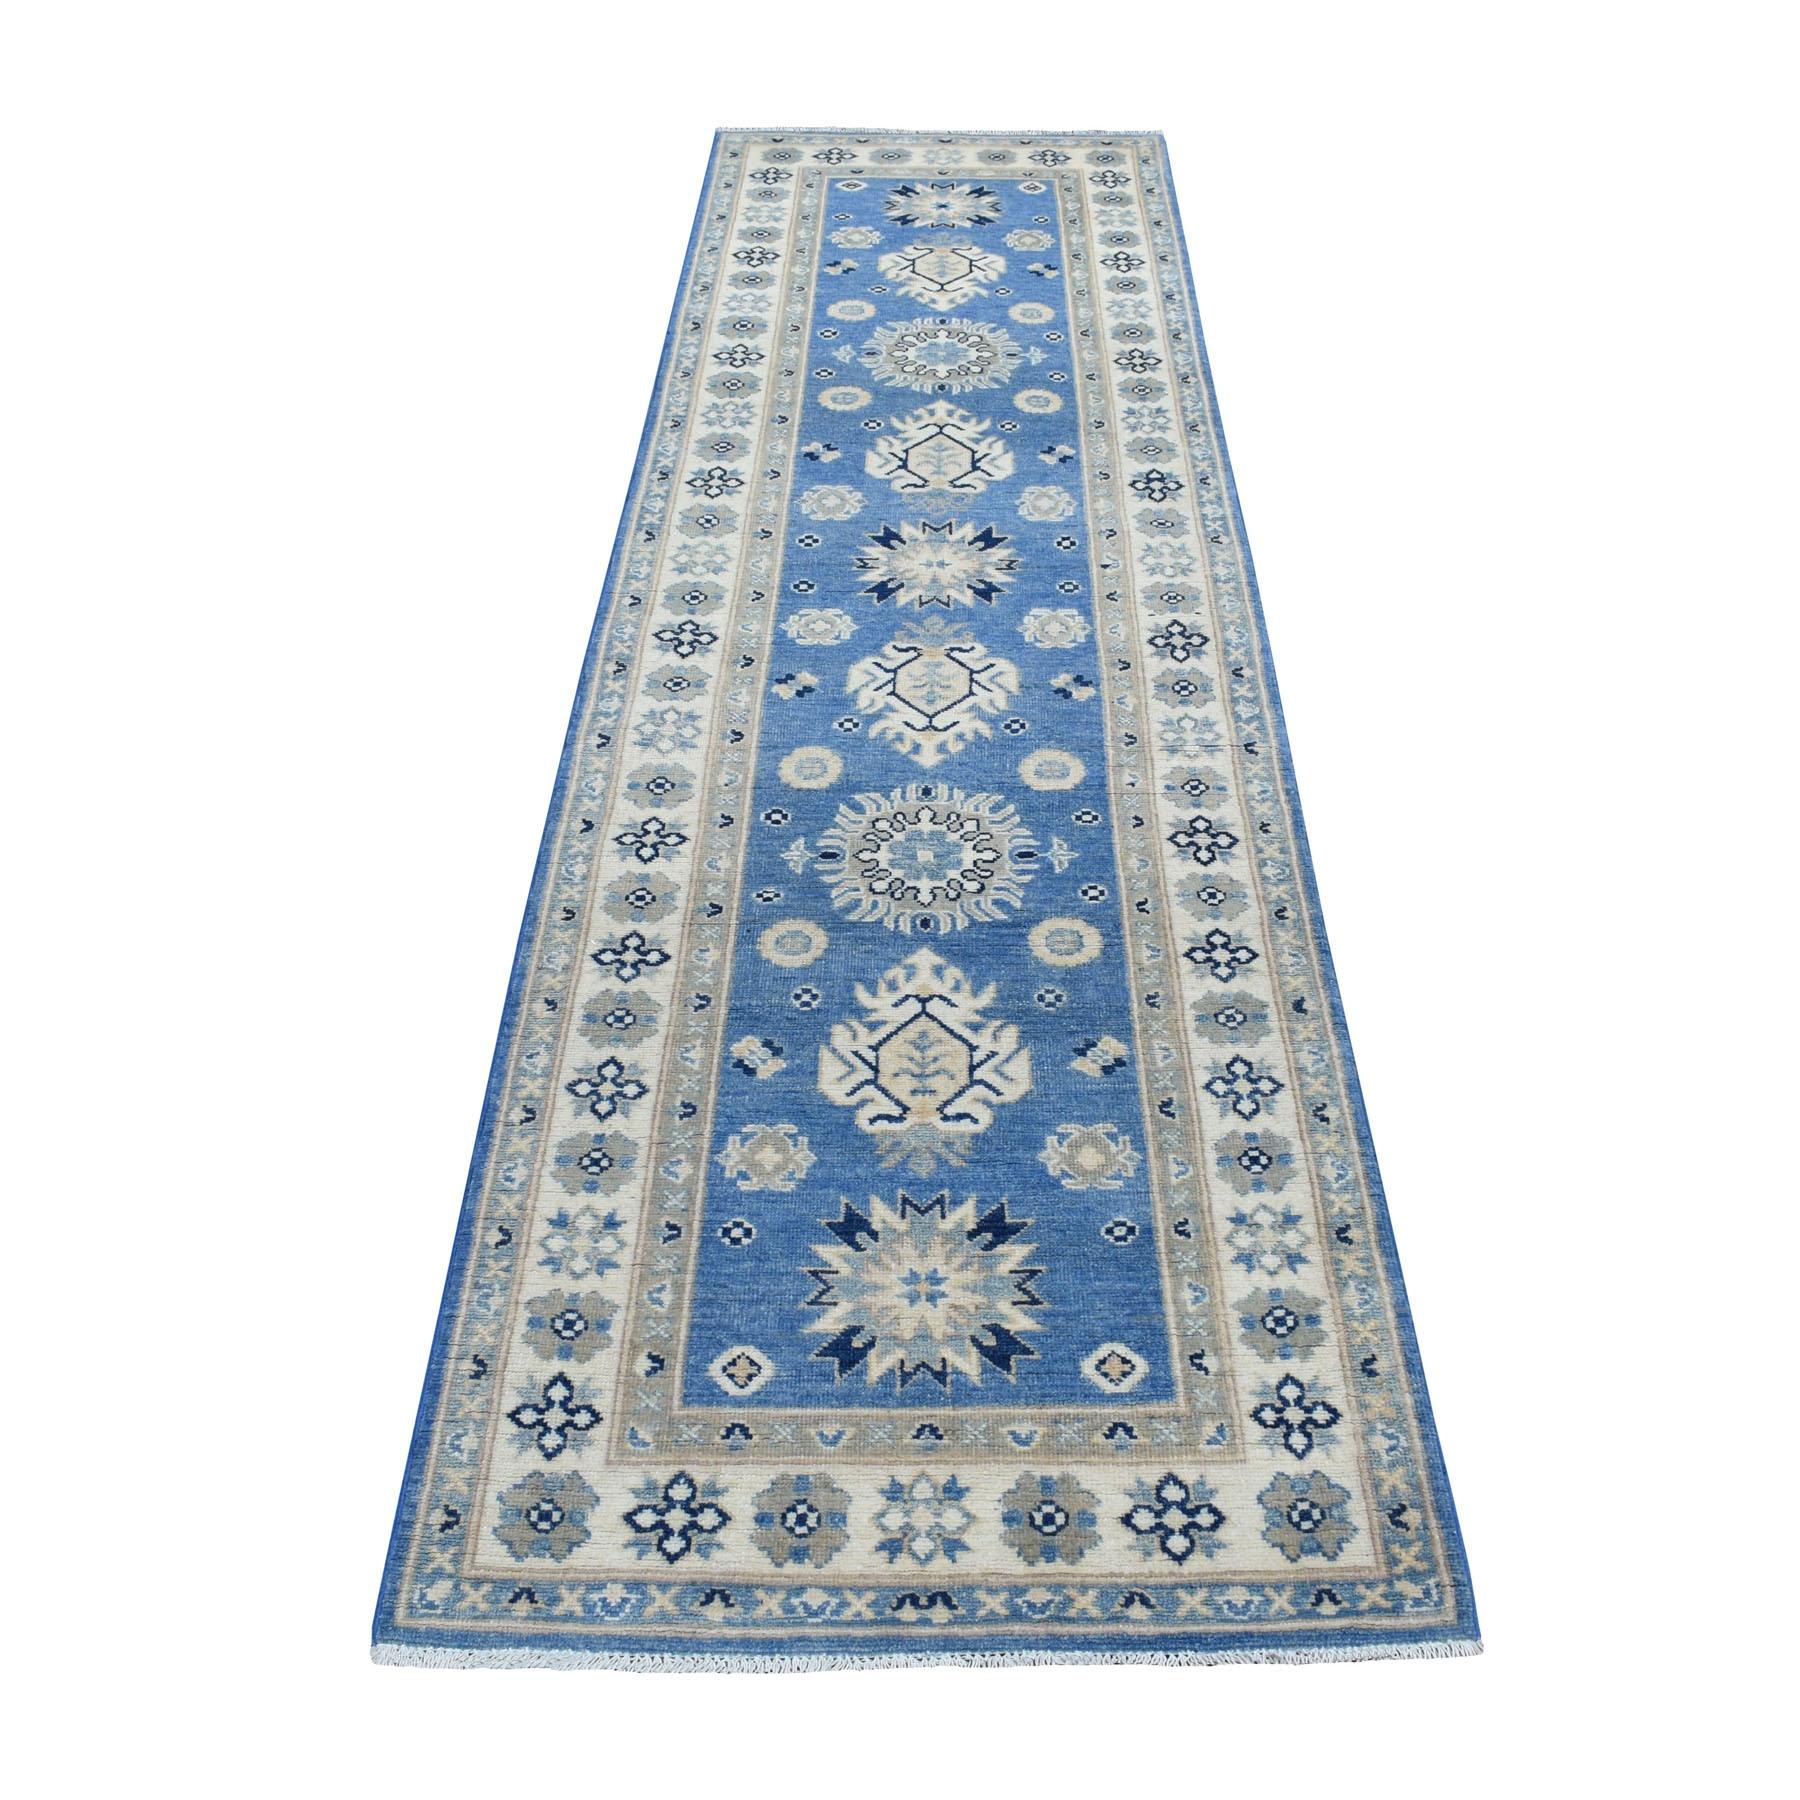 "2'9""x9'6"" Blue Organic Wool Vintage Look Kazak Hand Knotted Runner Oriental Rug"